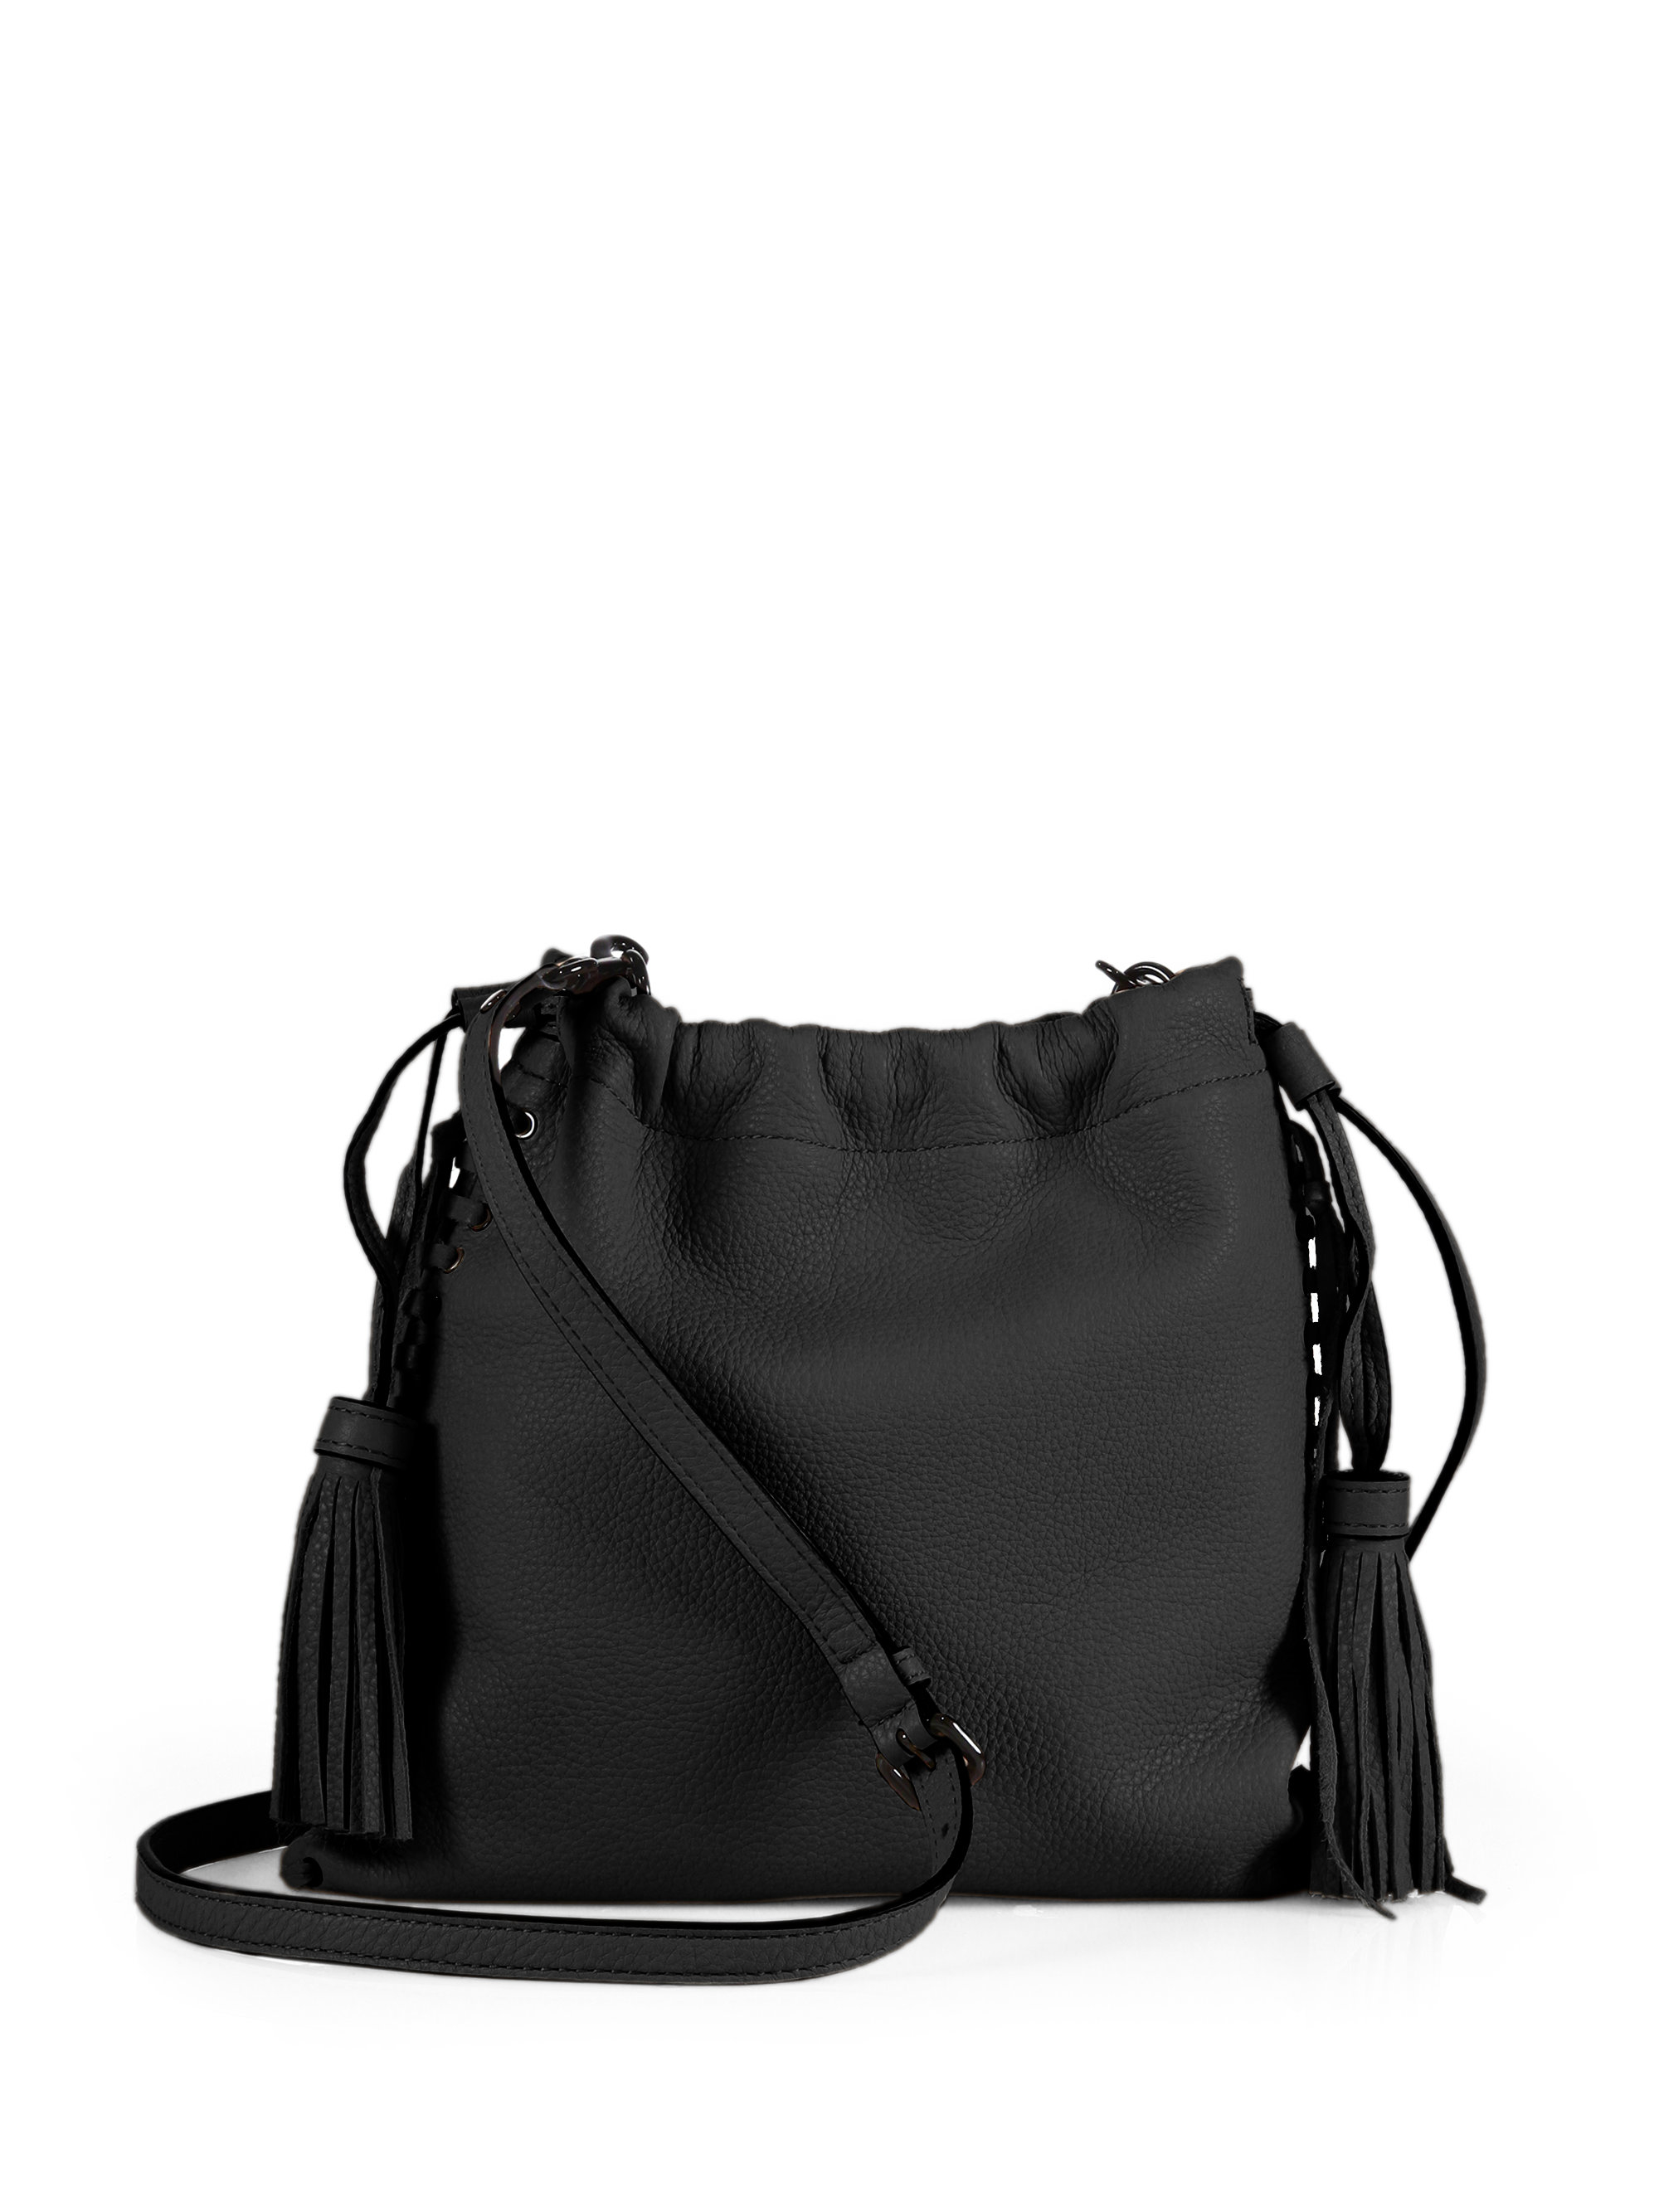 Rebecca minkoff Moto Leather Drawstring Crossbody Bag in Black | Lyst